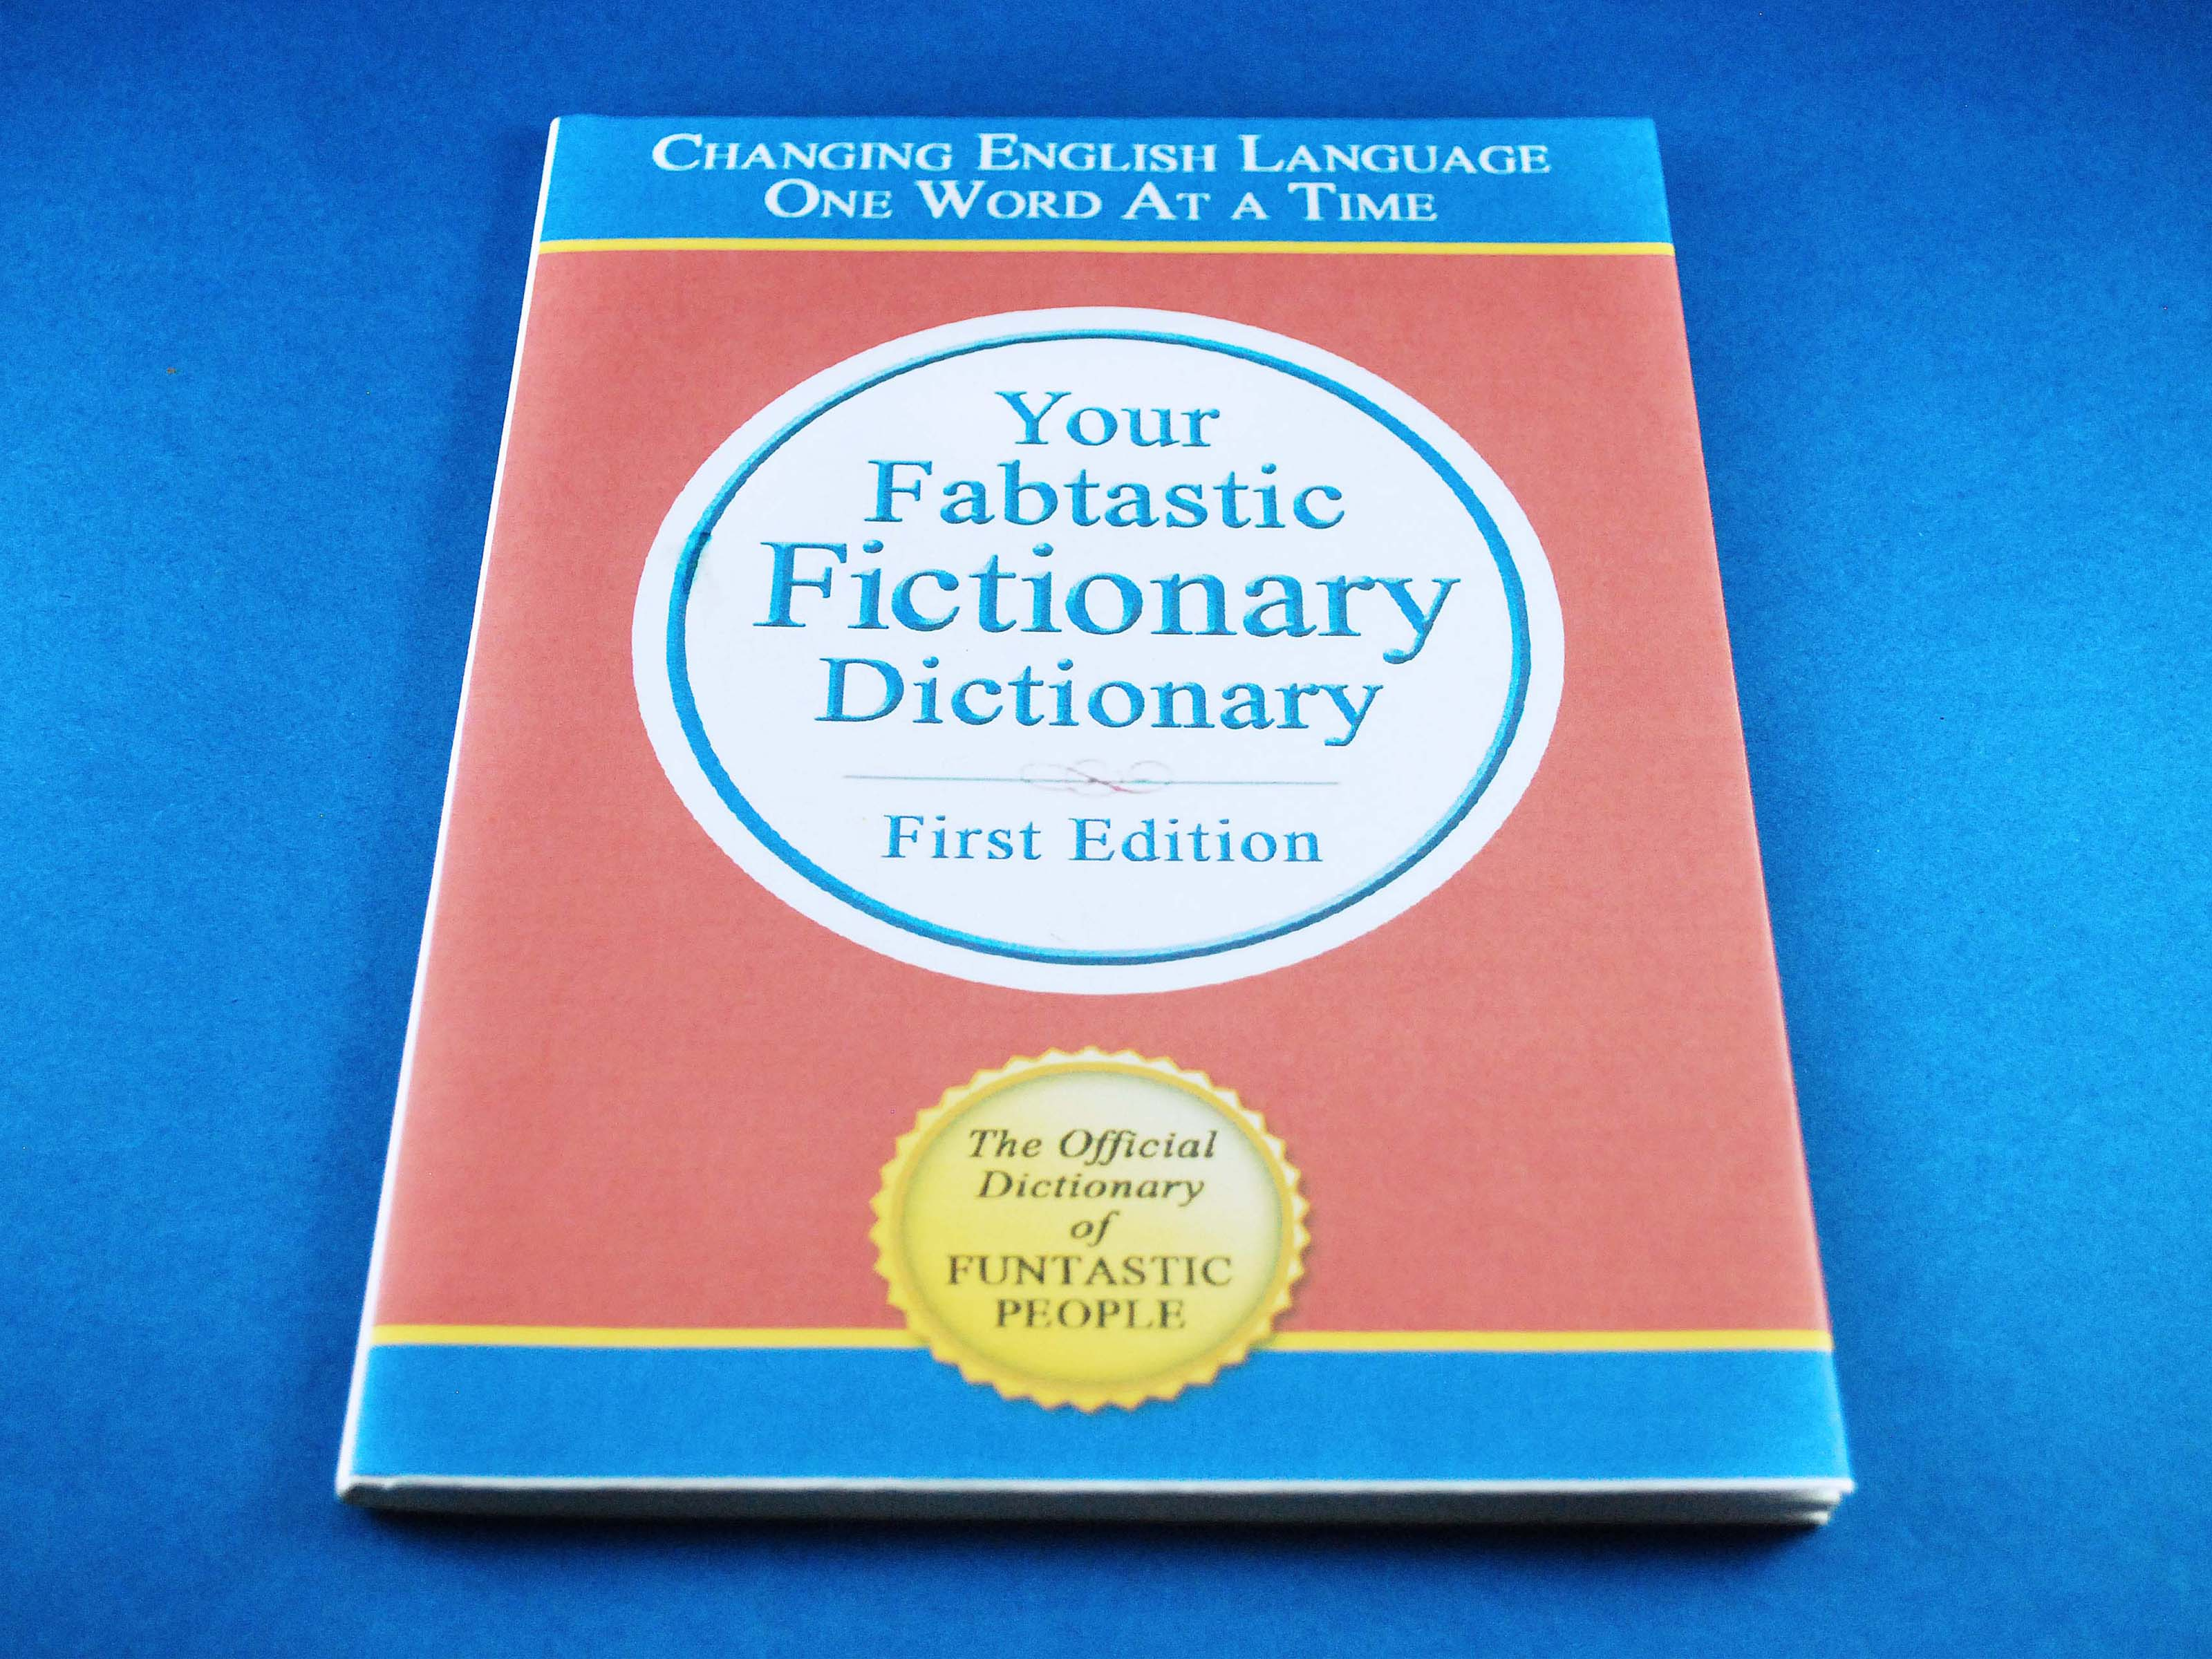 pass dictionary via argparse